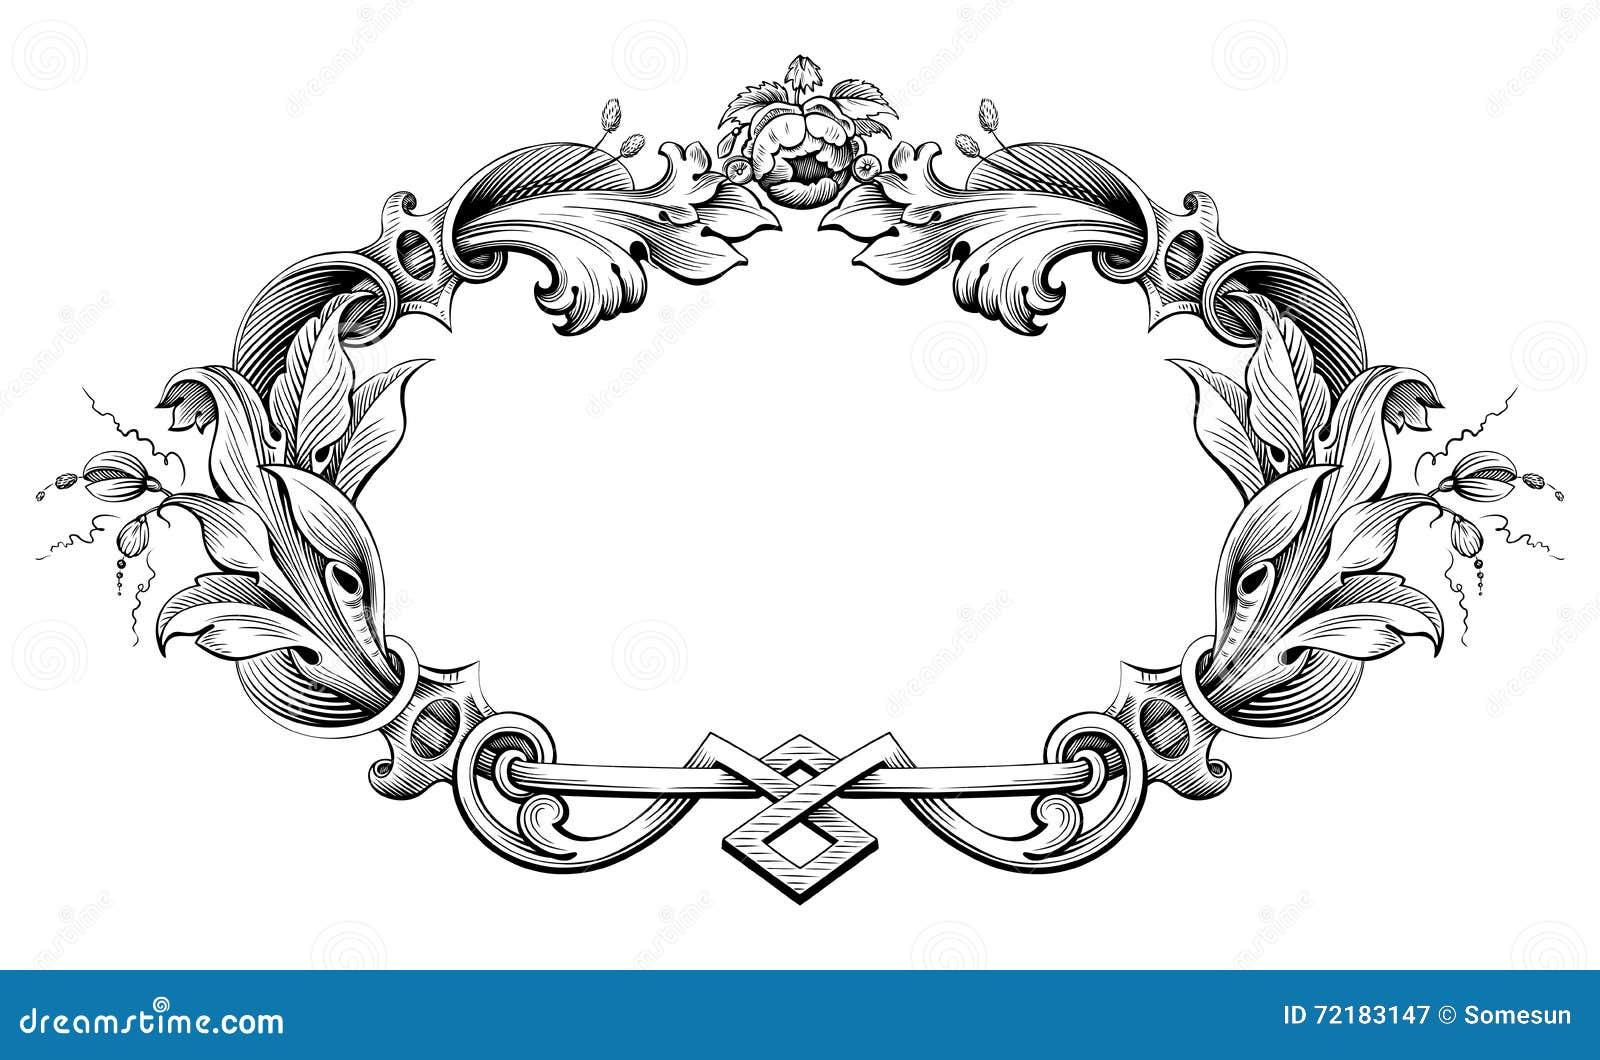 Vintage Baroque Victorian frame border monogram floral ornament scroll engraved retro pattern tattoo calligraphic